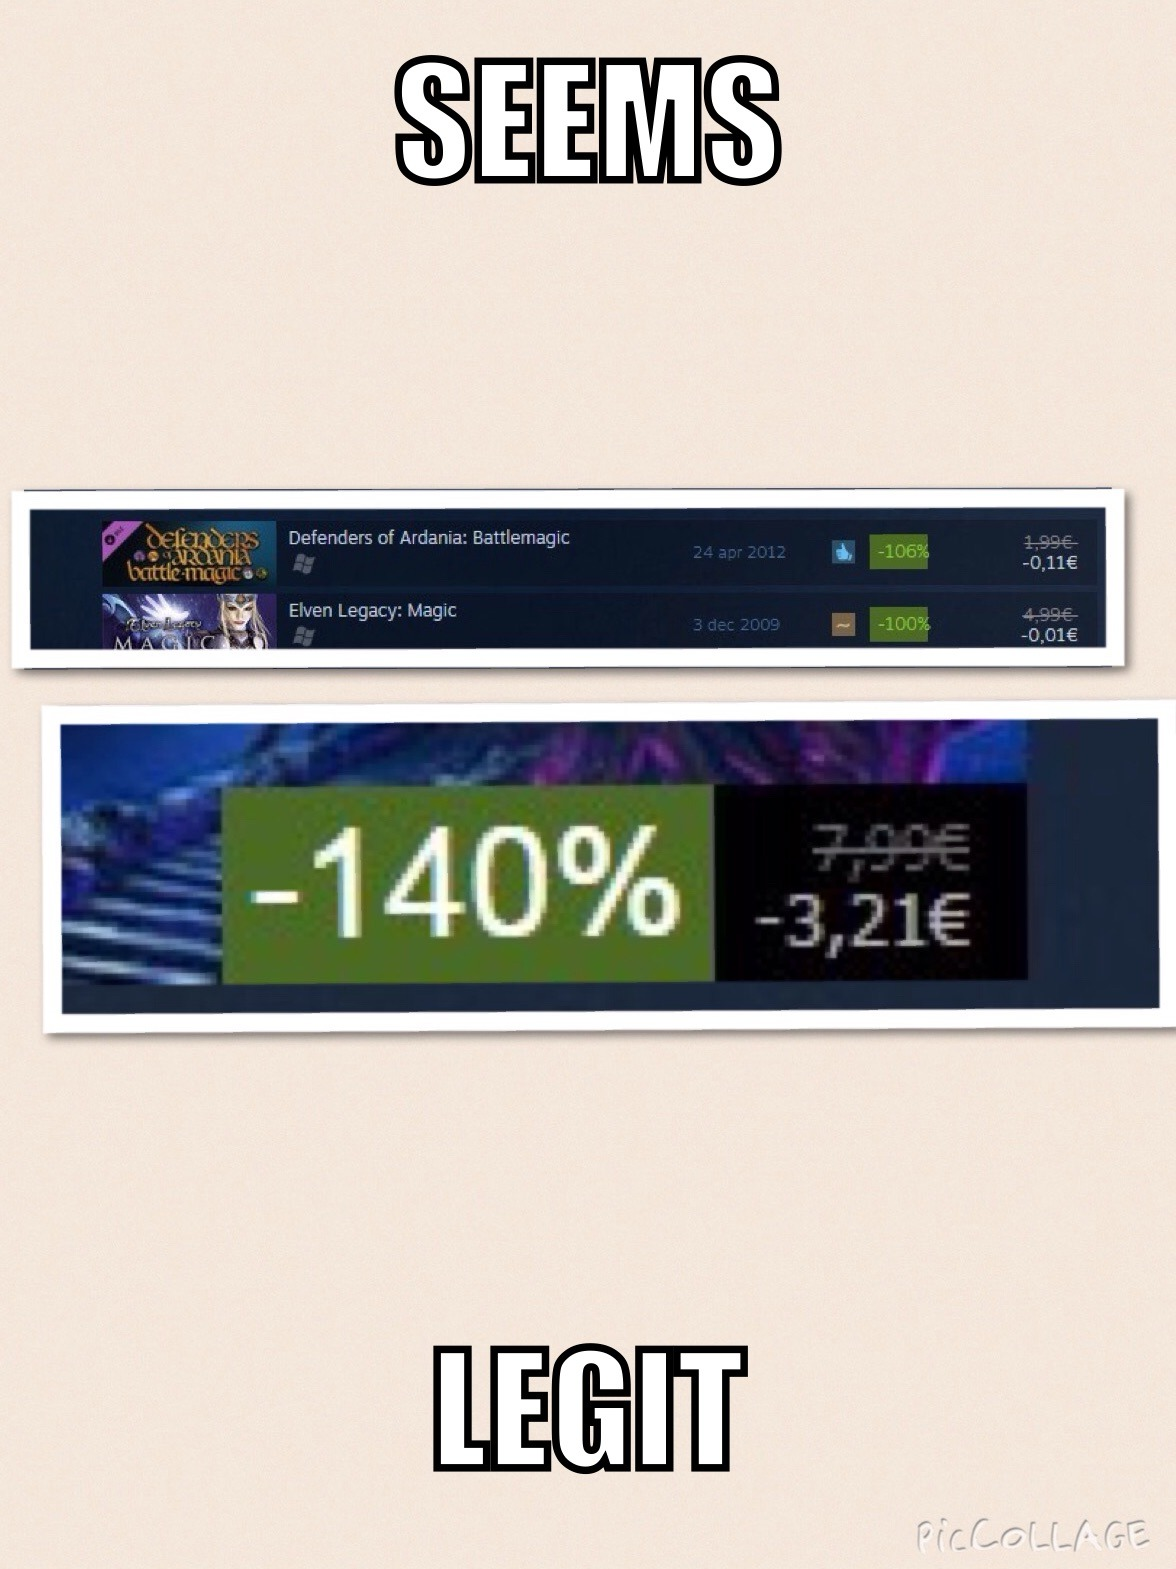 Steam summer sale! - meme